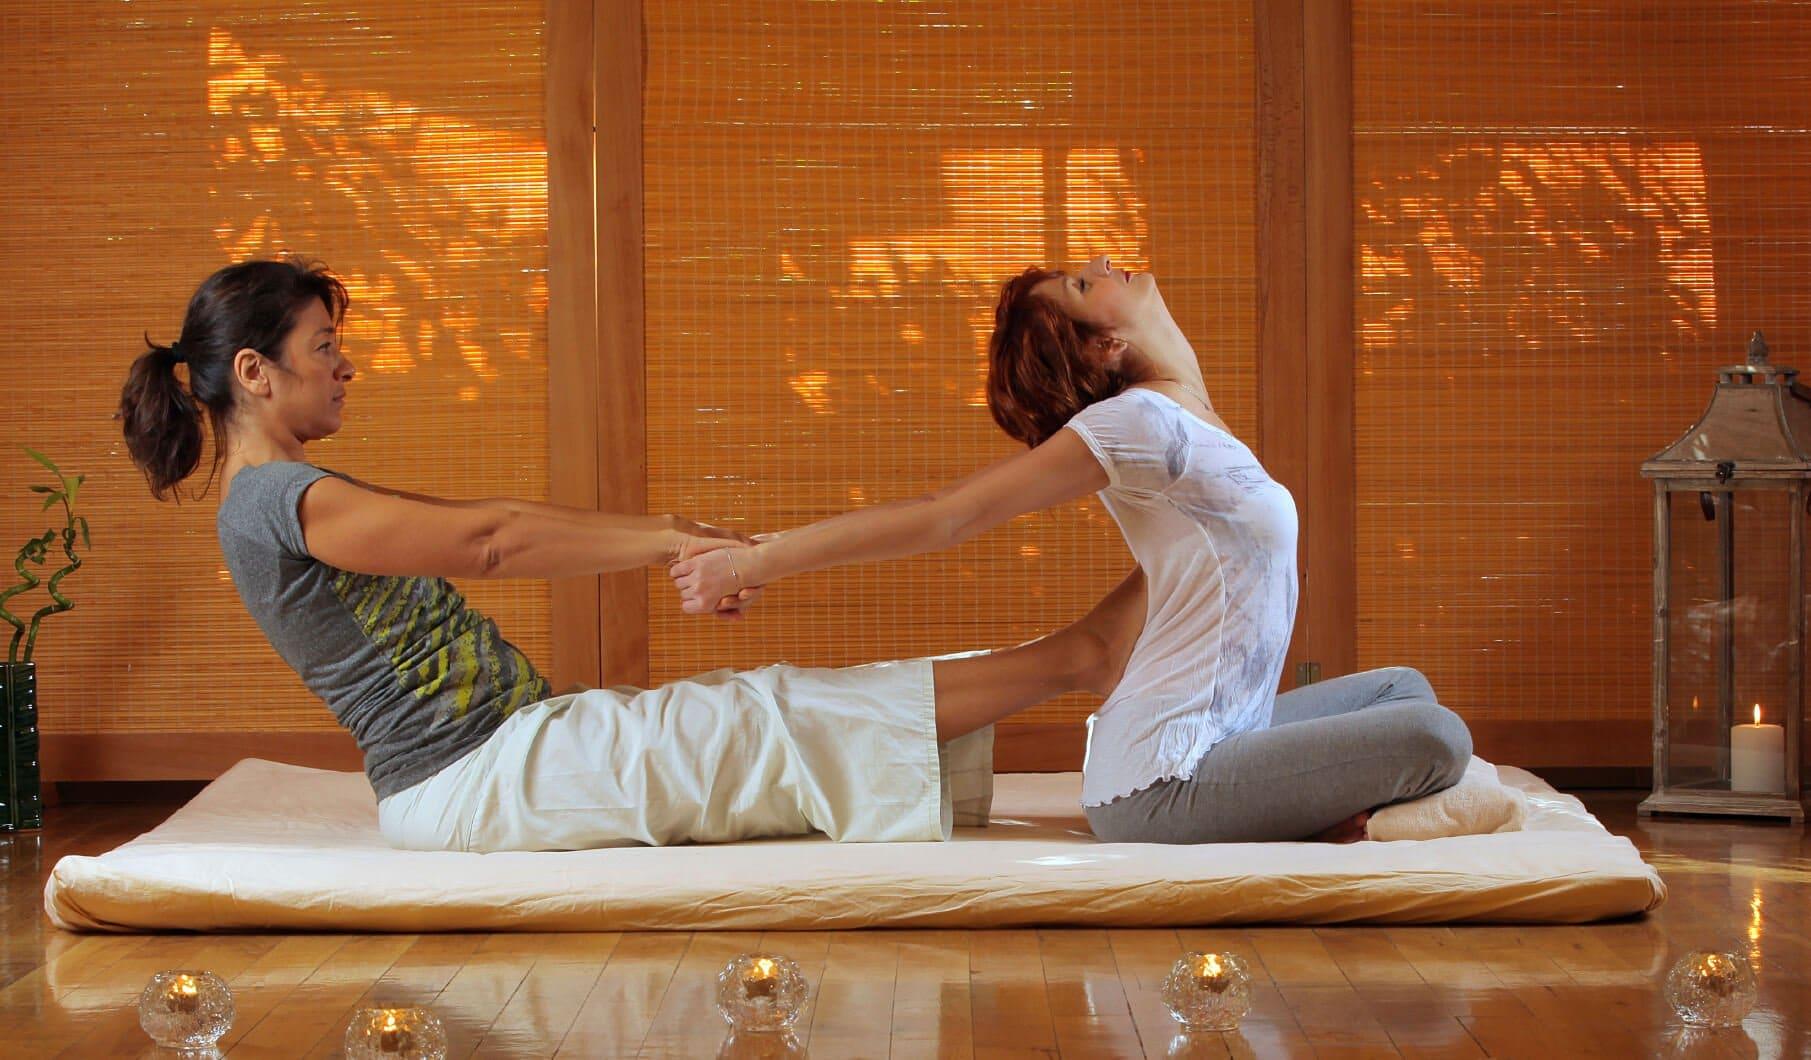 thai massage guide skin apeel. Black Bedroom Furniture Sets. Home Design Ideas